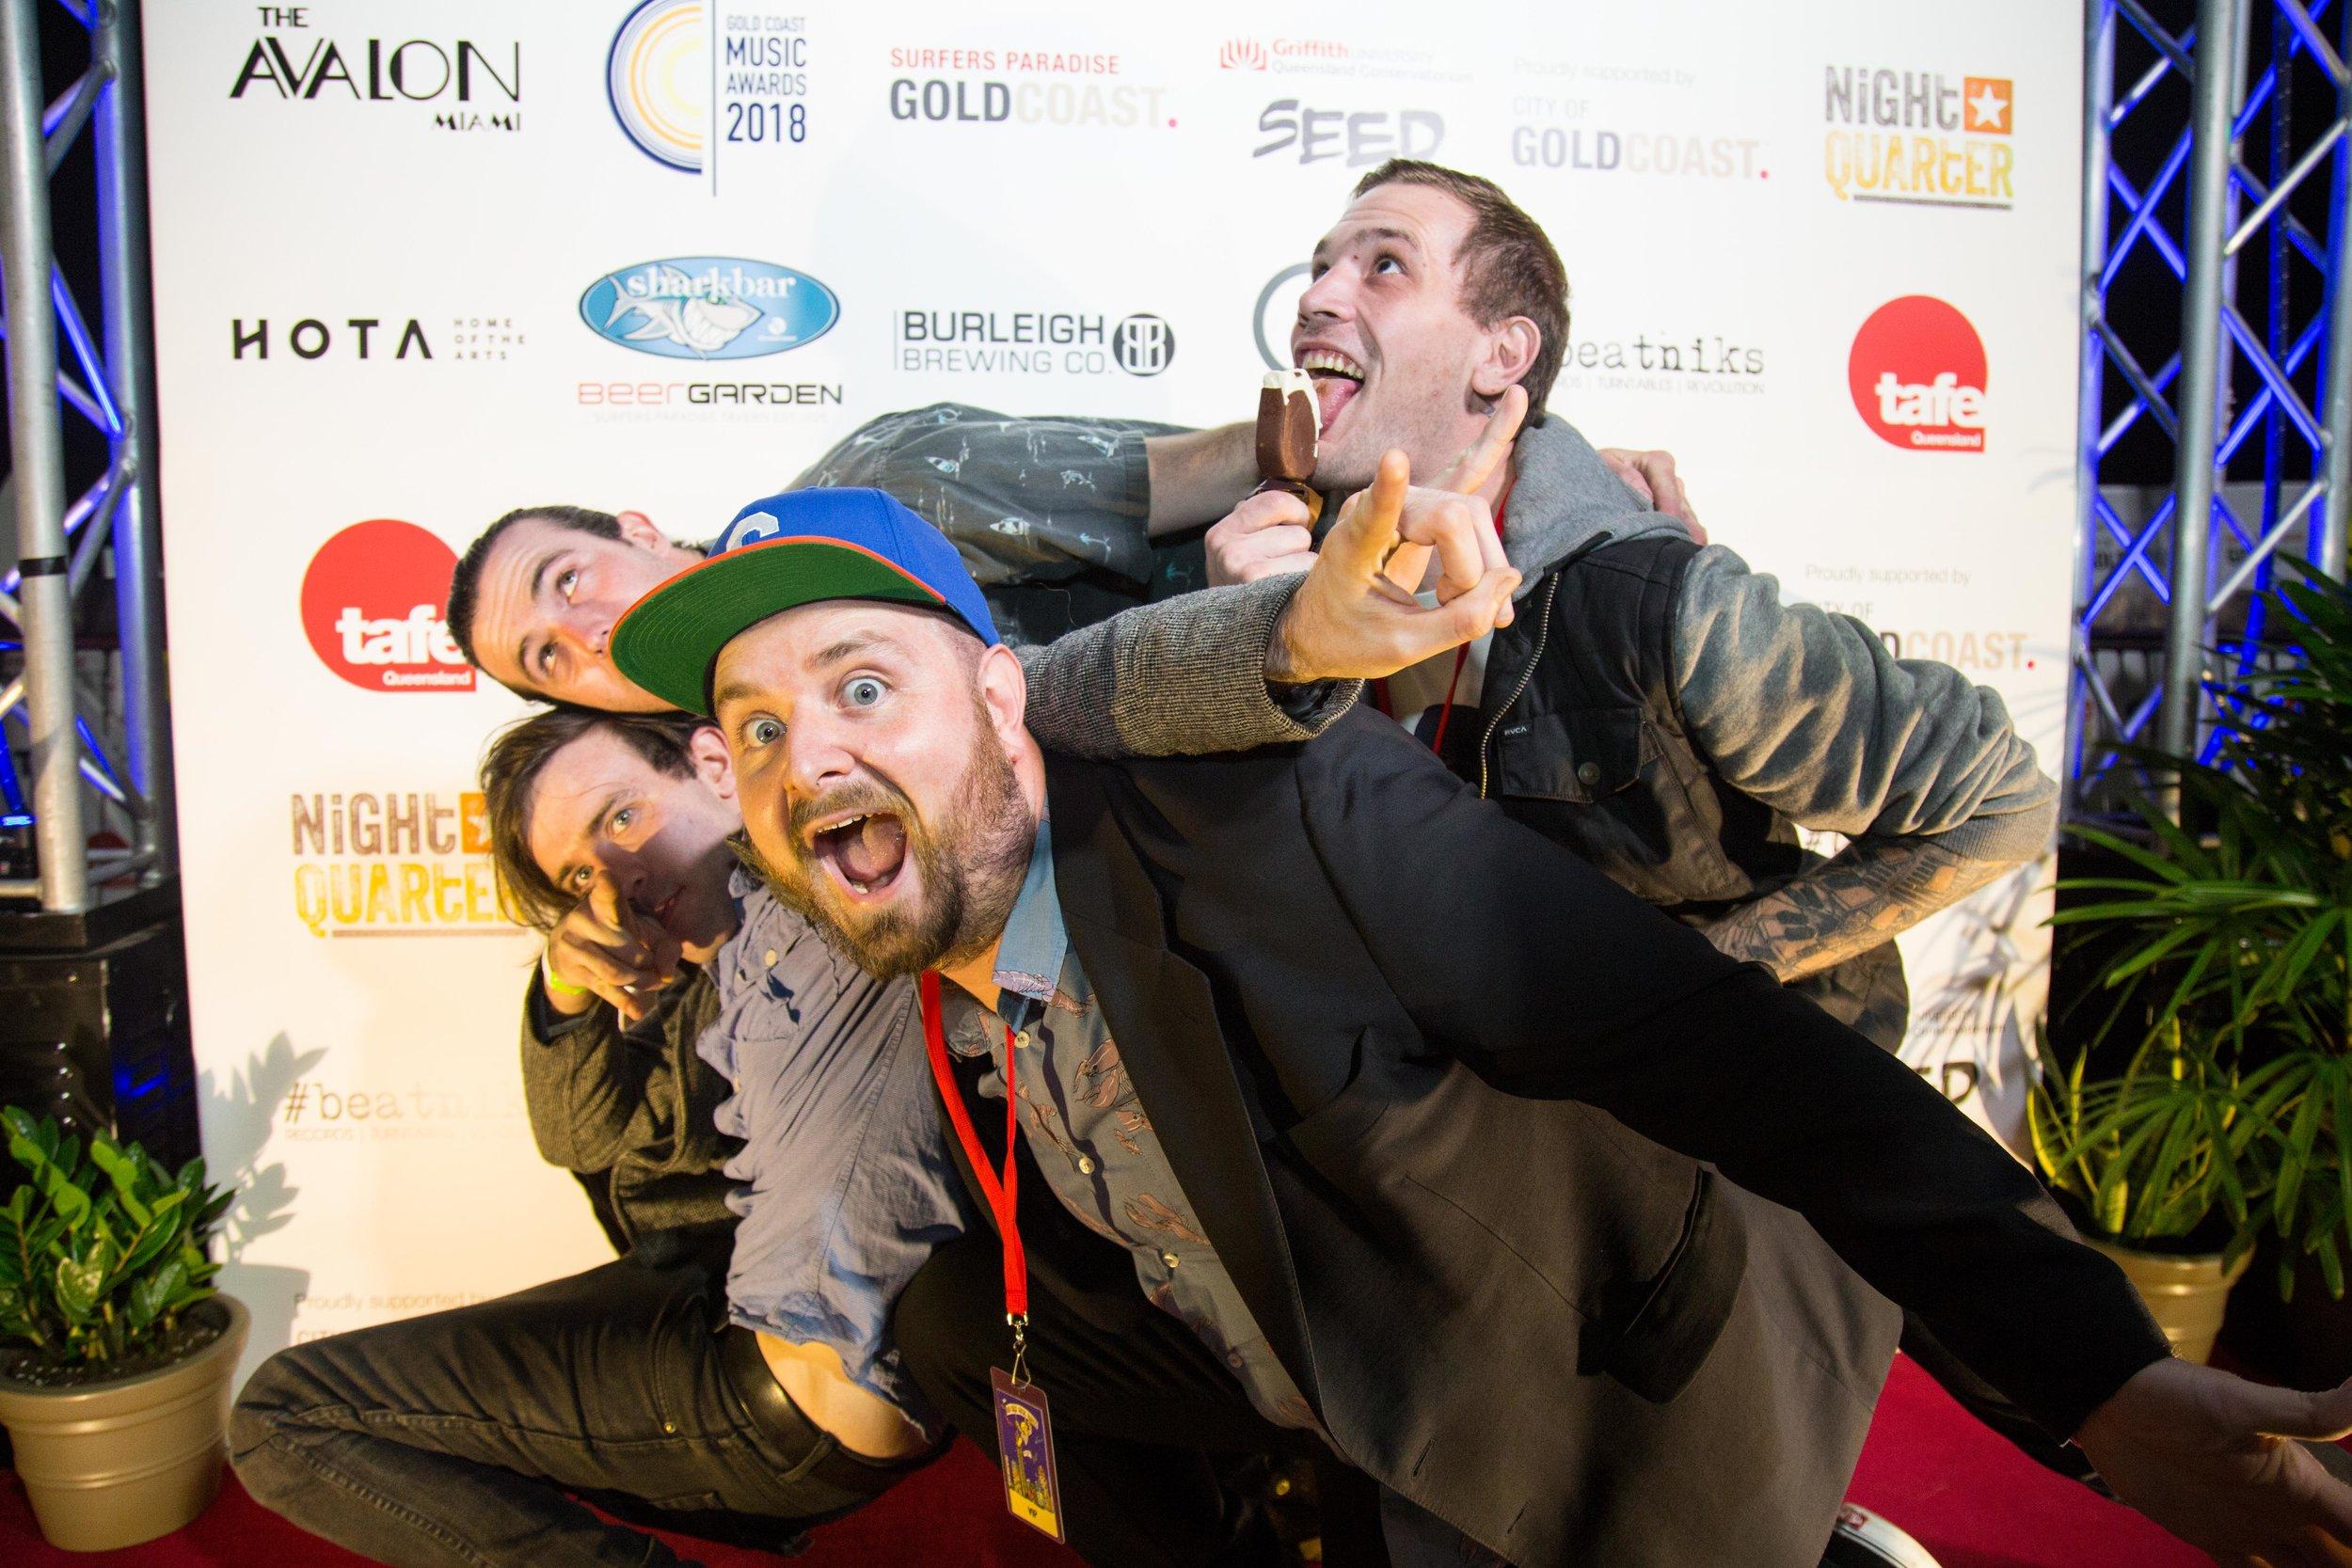 Electrik Lemonade, 2018 Gold Coast Music Awards finalists and live performers.